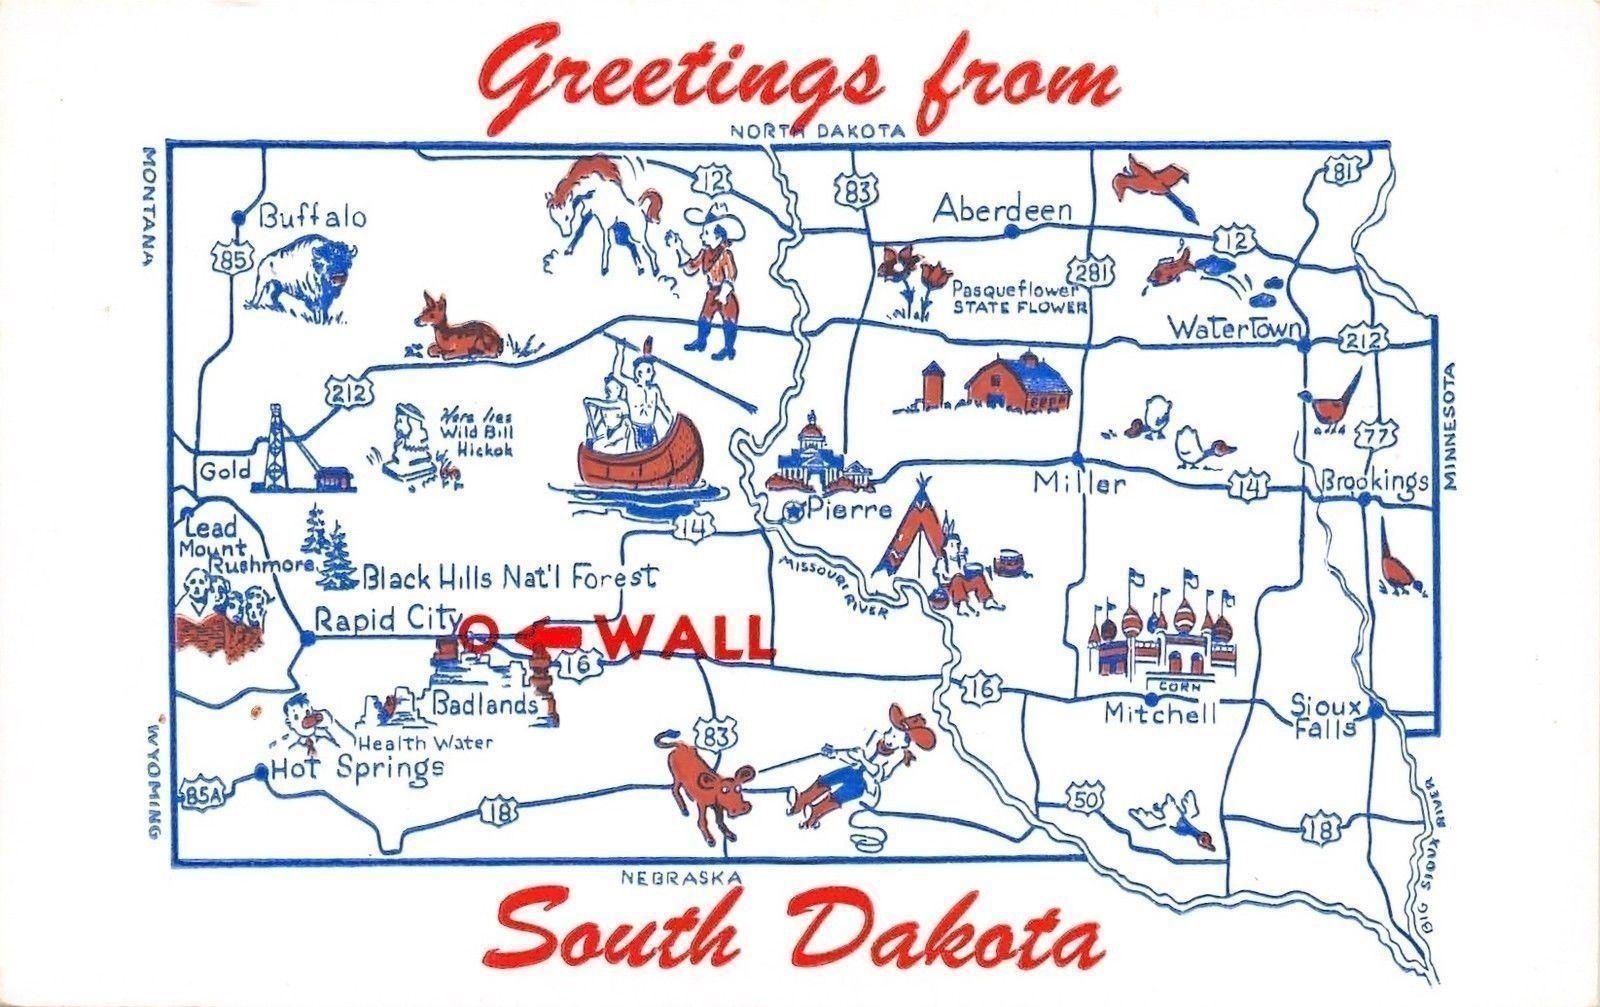 South Dakota State Map~Buffalo & Sioux Falls~Watertown to